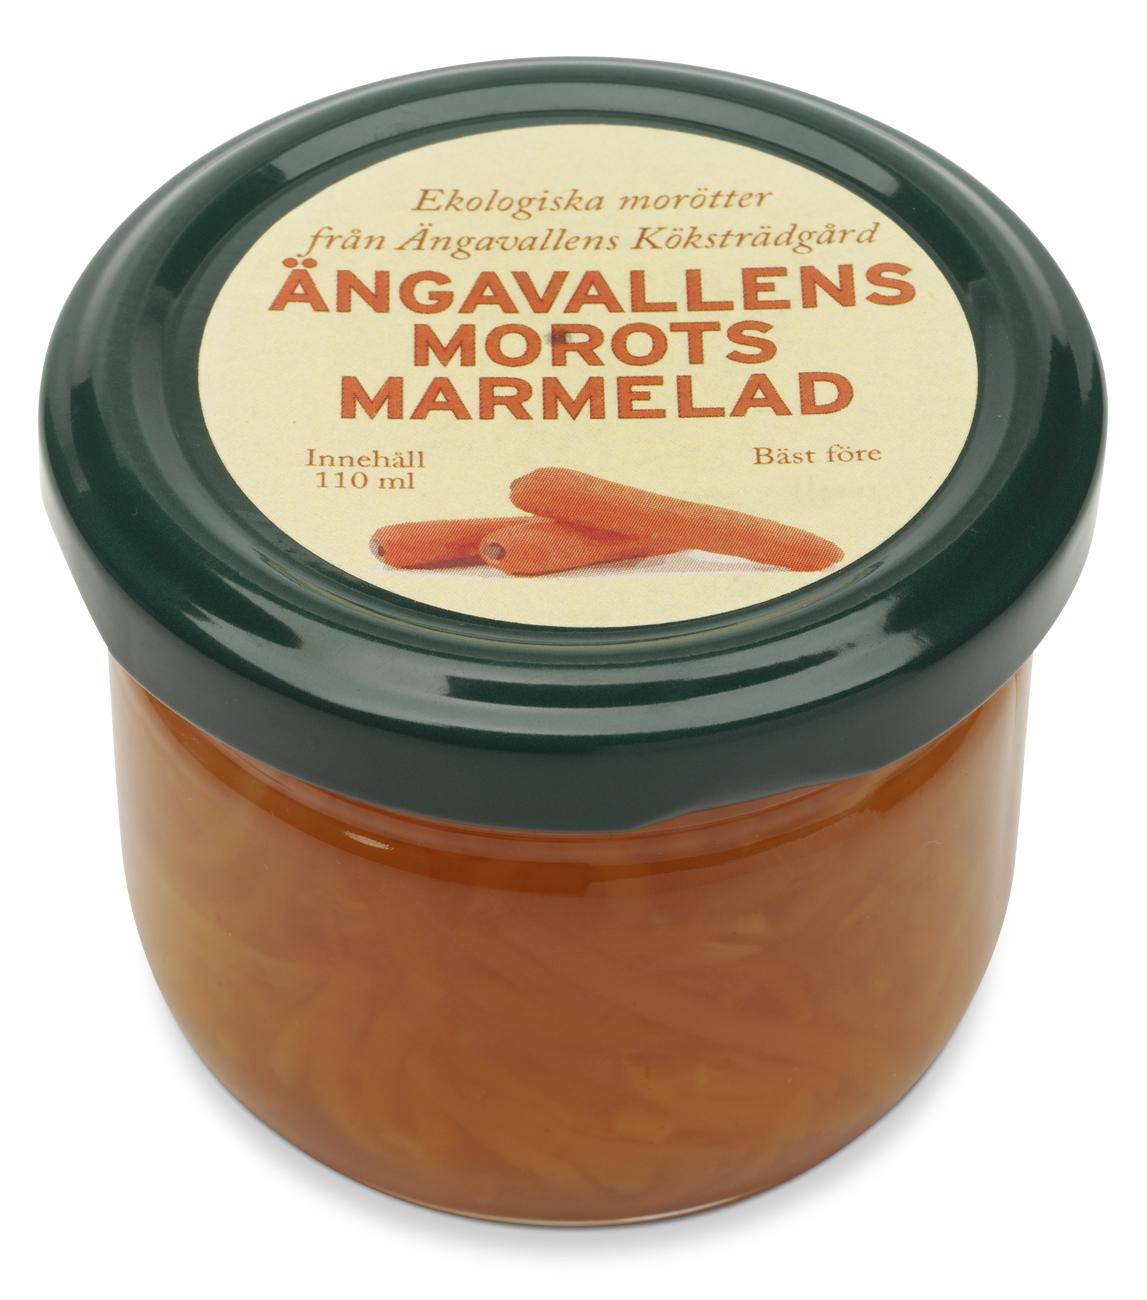 Ängavallens Gula morots marmelad